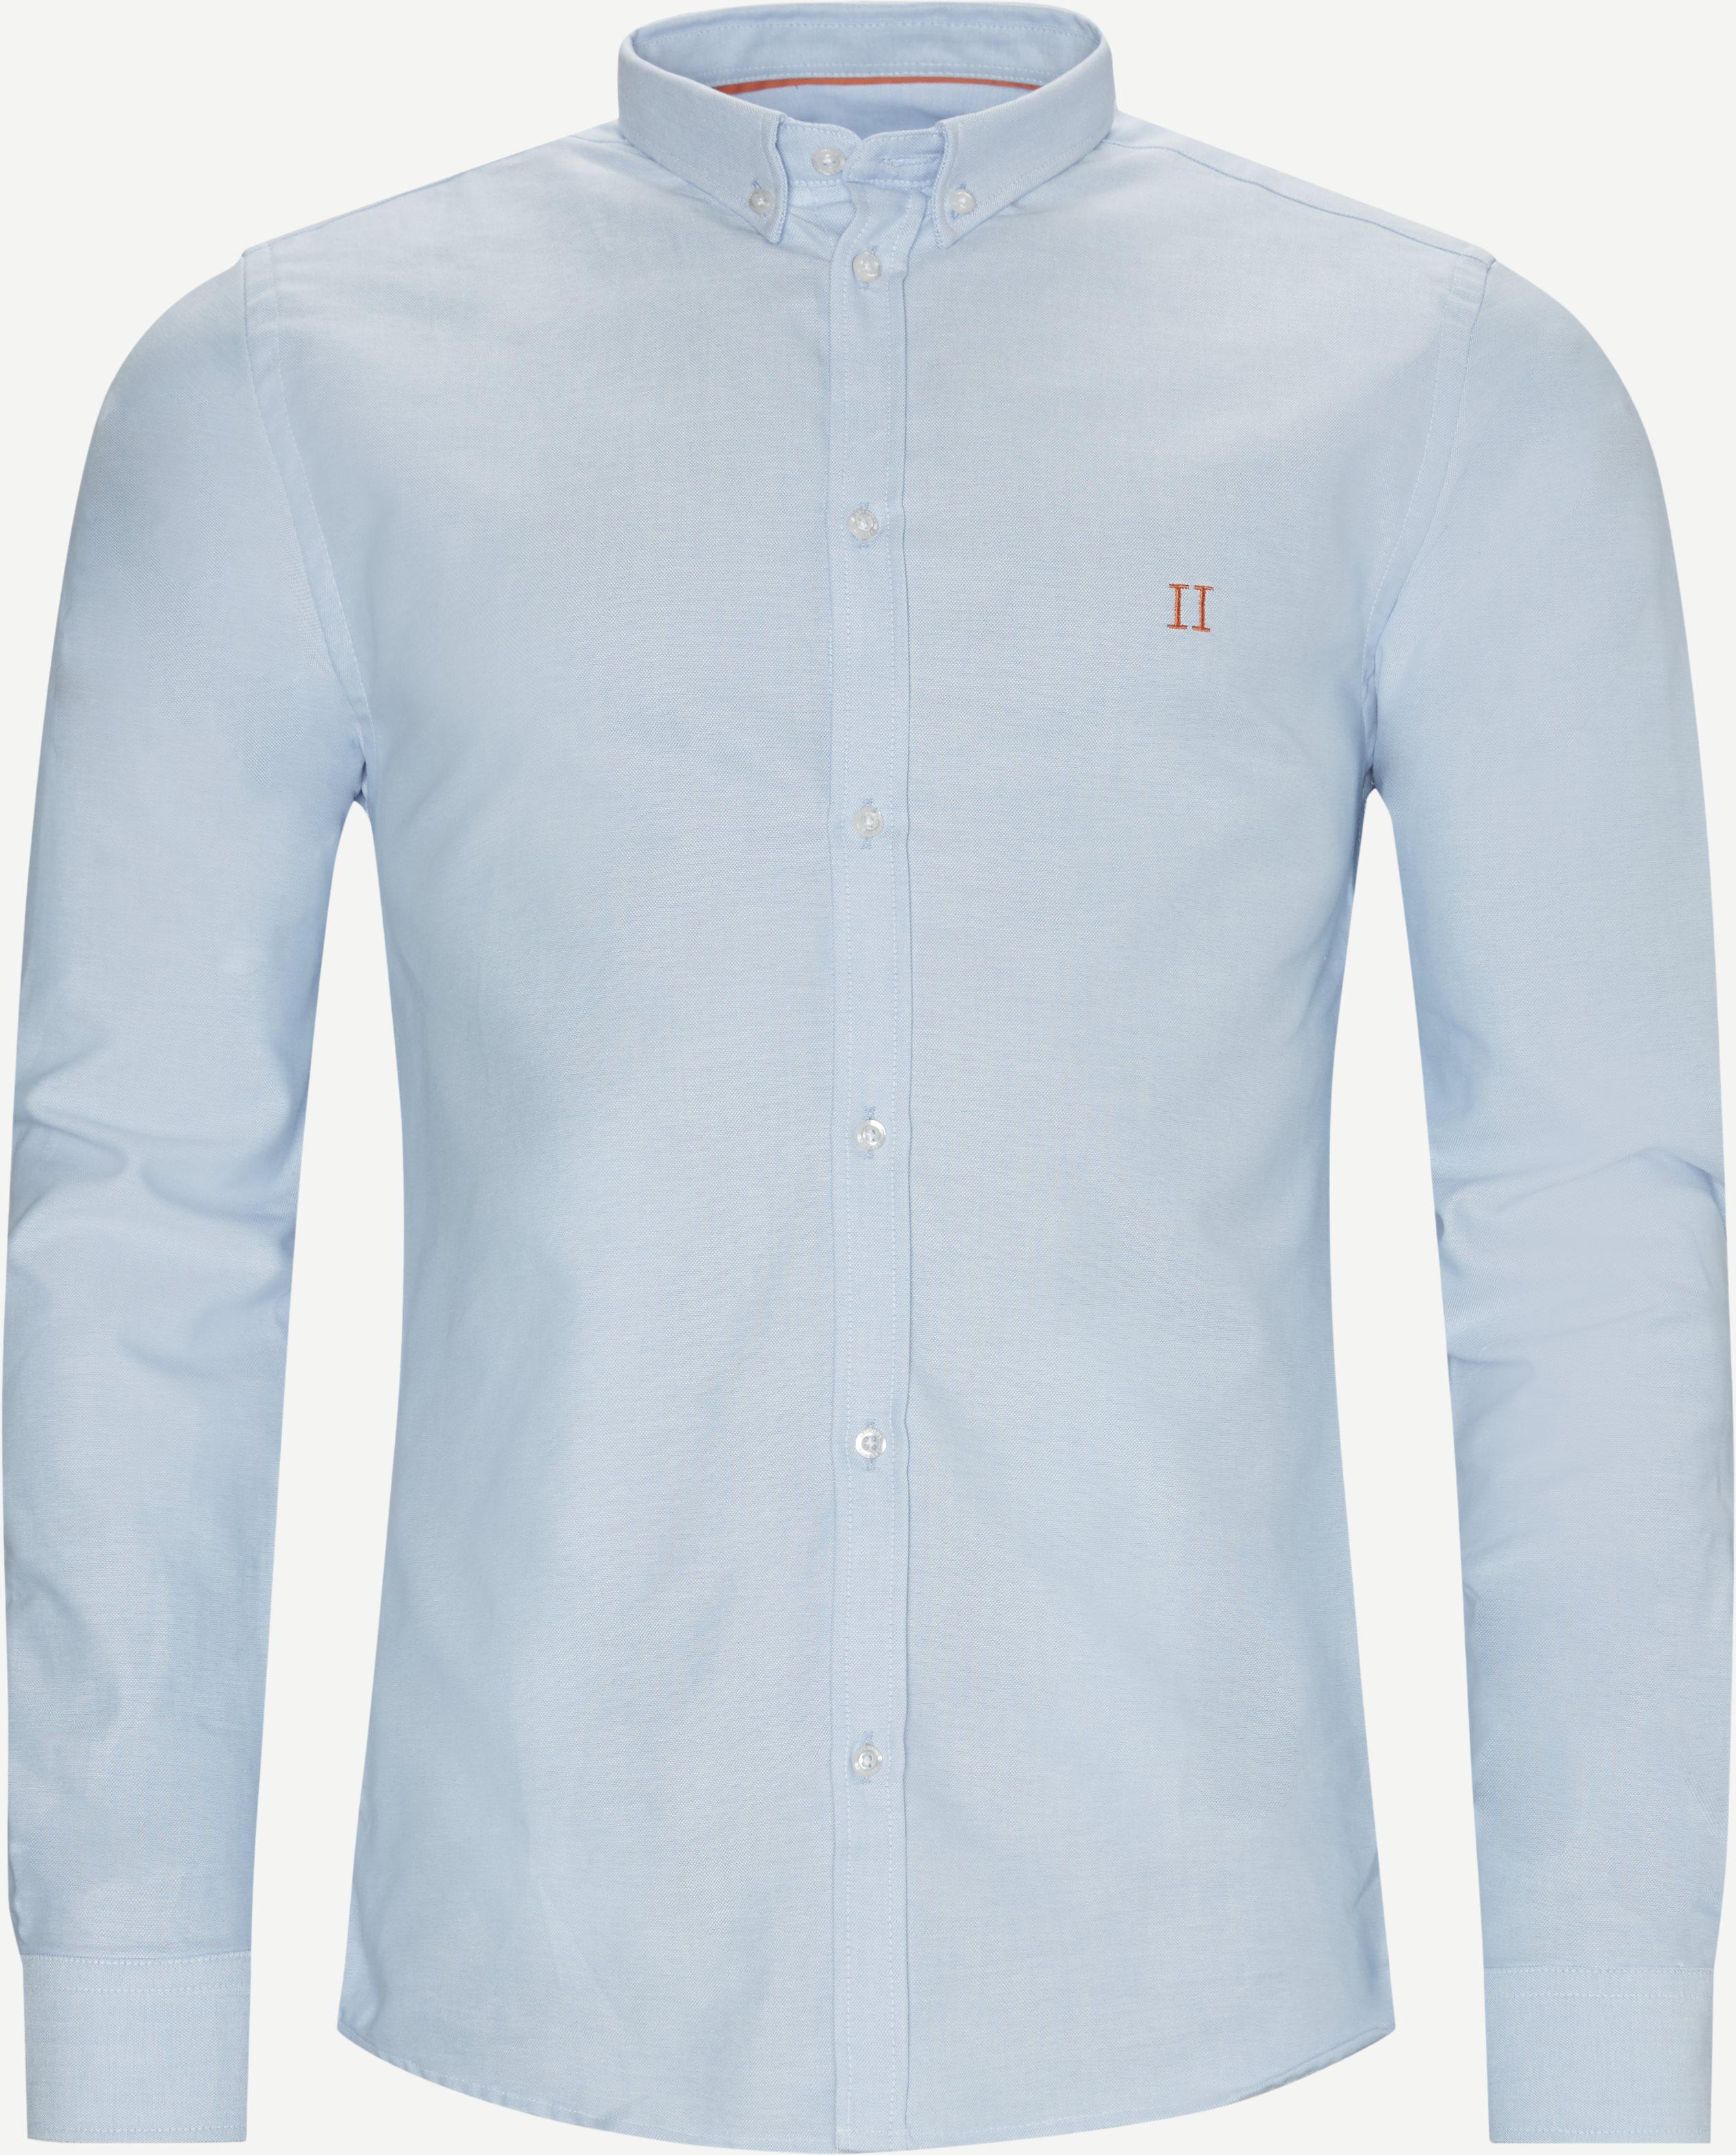 Oliver Oxford Shirt - Shirts - Slim - Blue